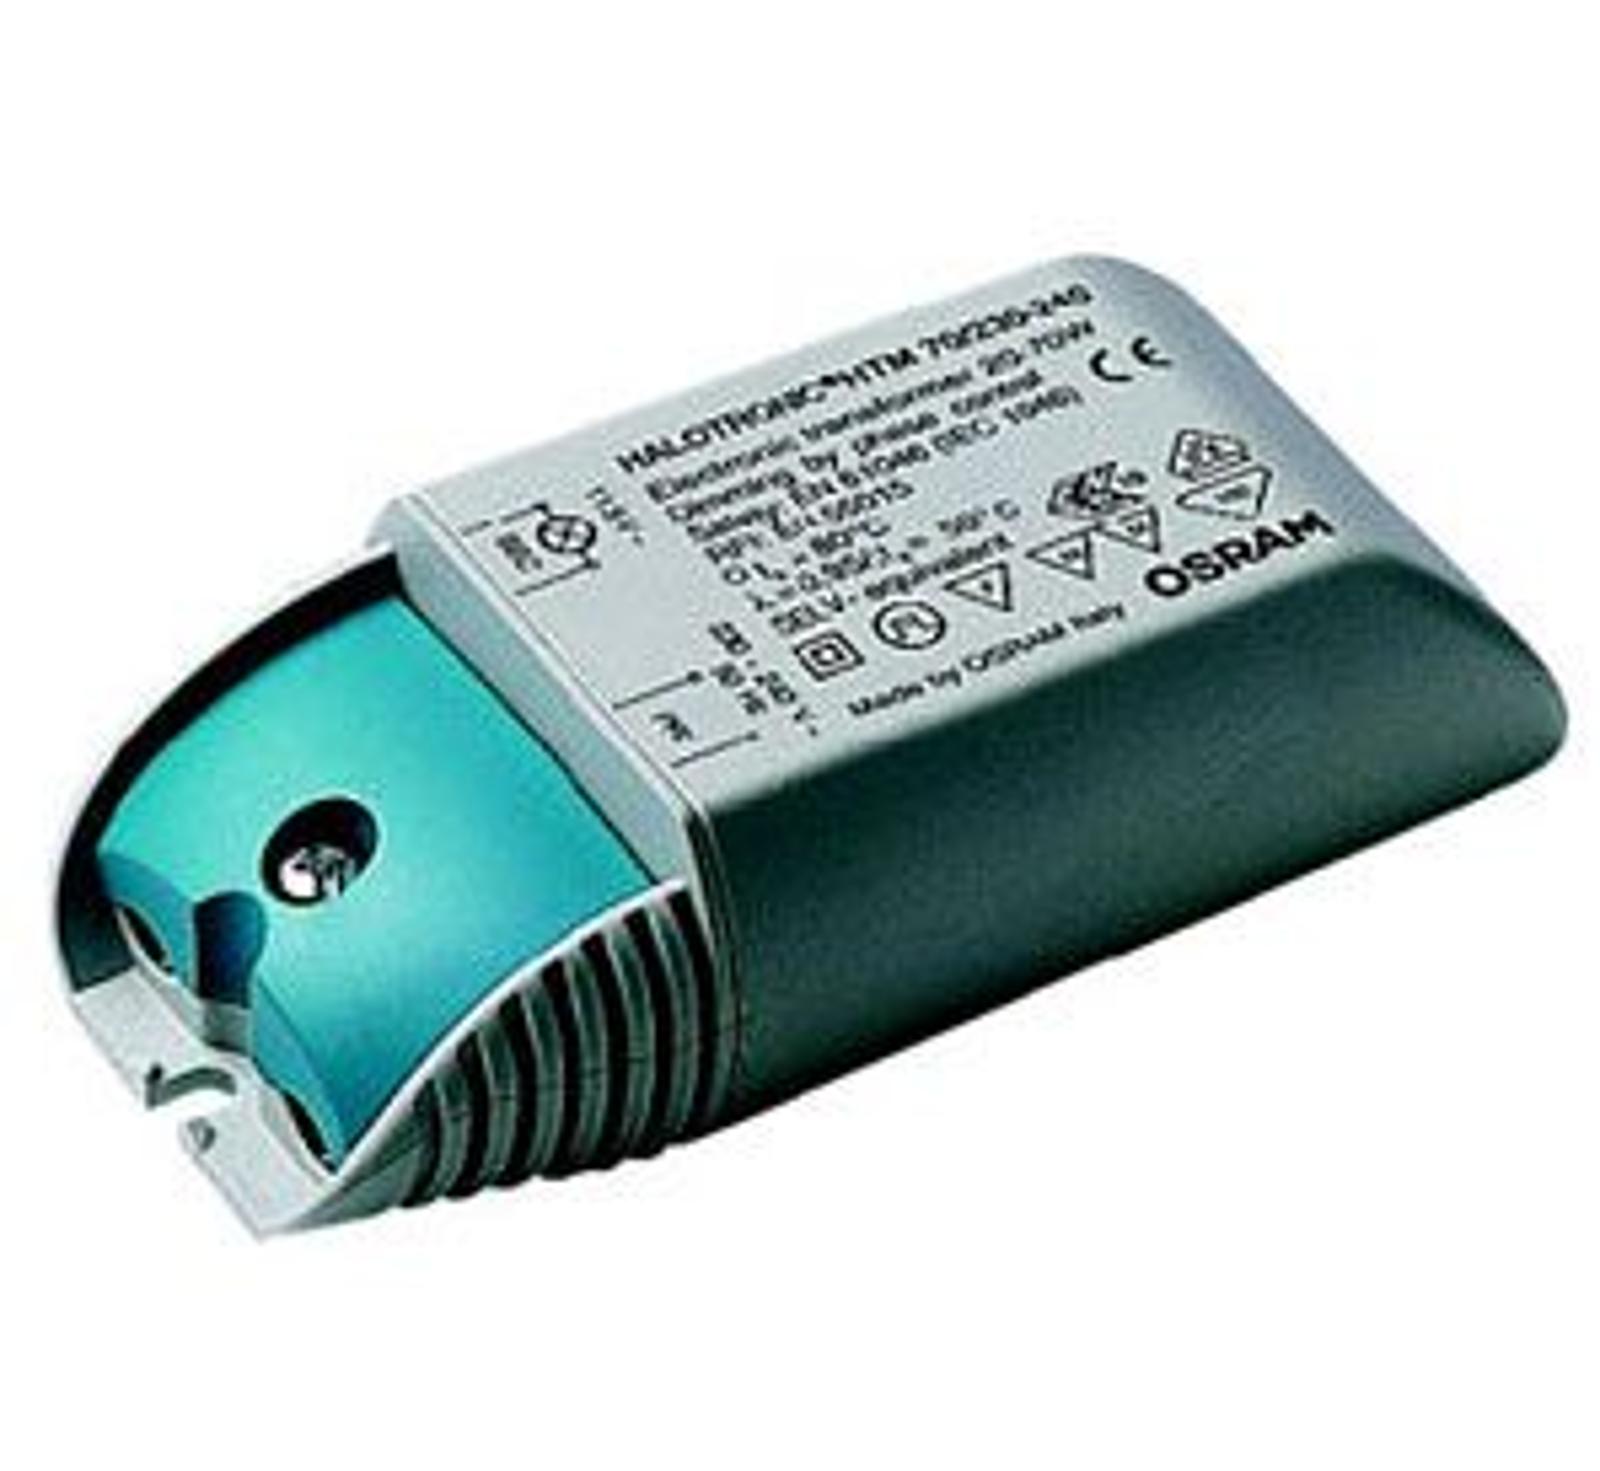 OSRAM 70VA Muuntaja Halotronic Mouse